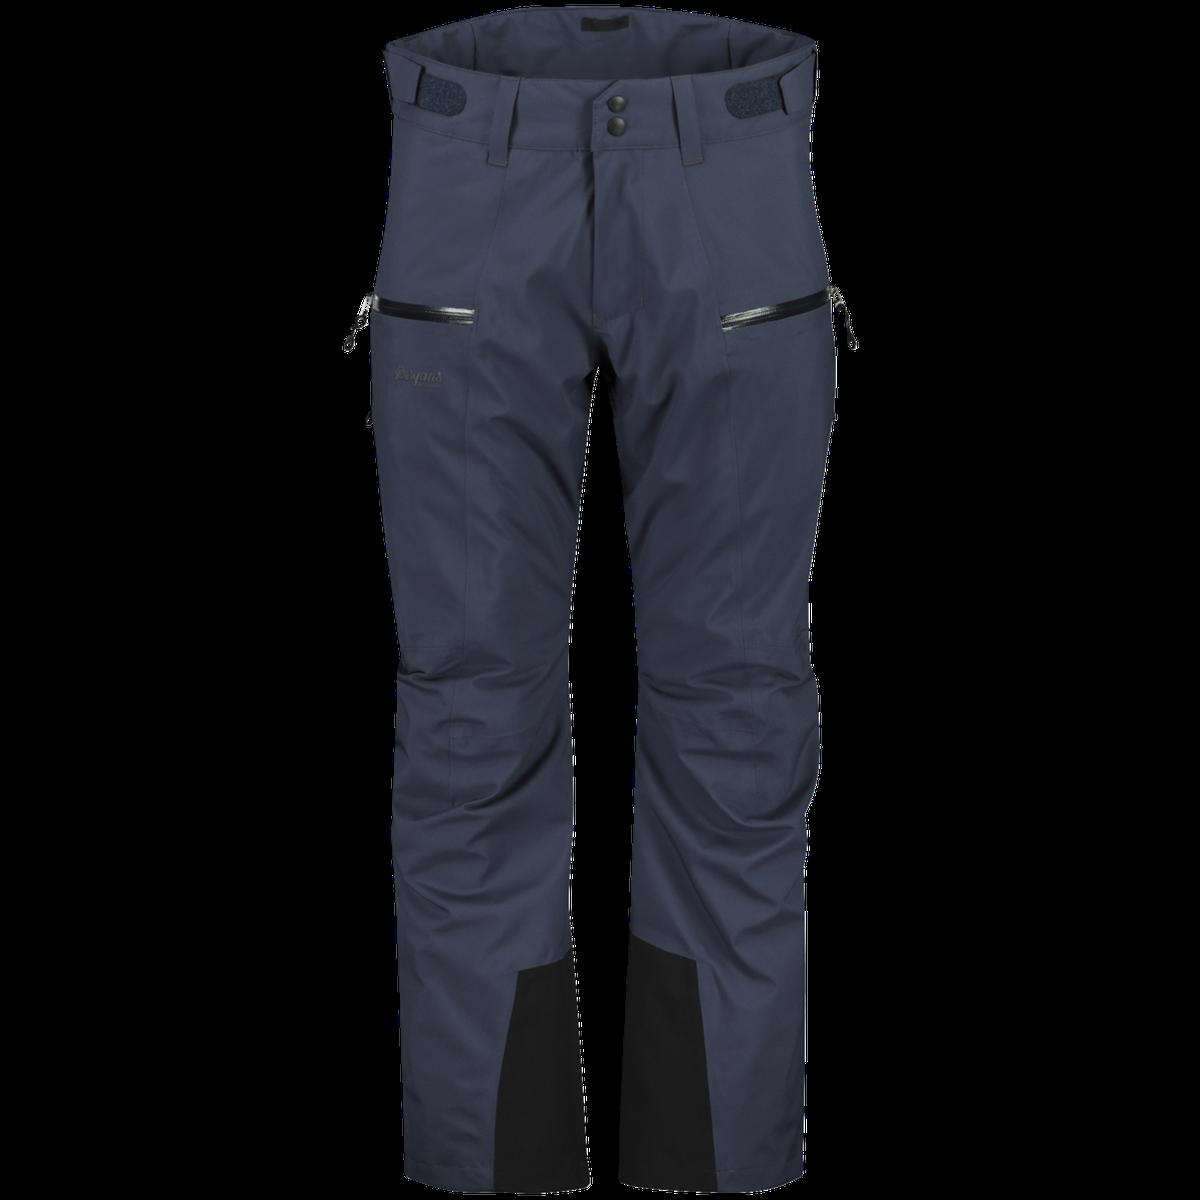 ffab7eb0 Bergans Stranda Insulated Pants, skibukse herre - Fiolett - Ski og  Snowboardbukser | XXL